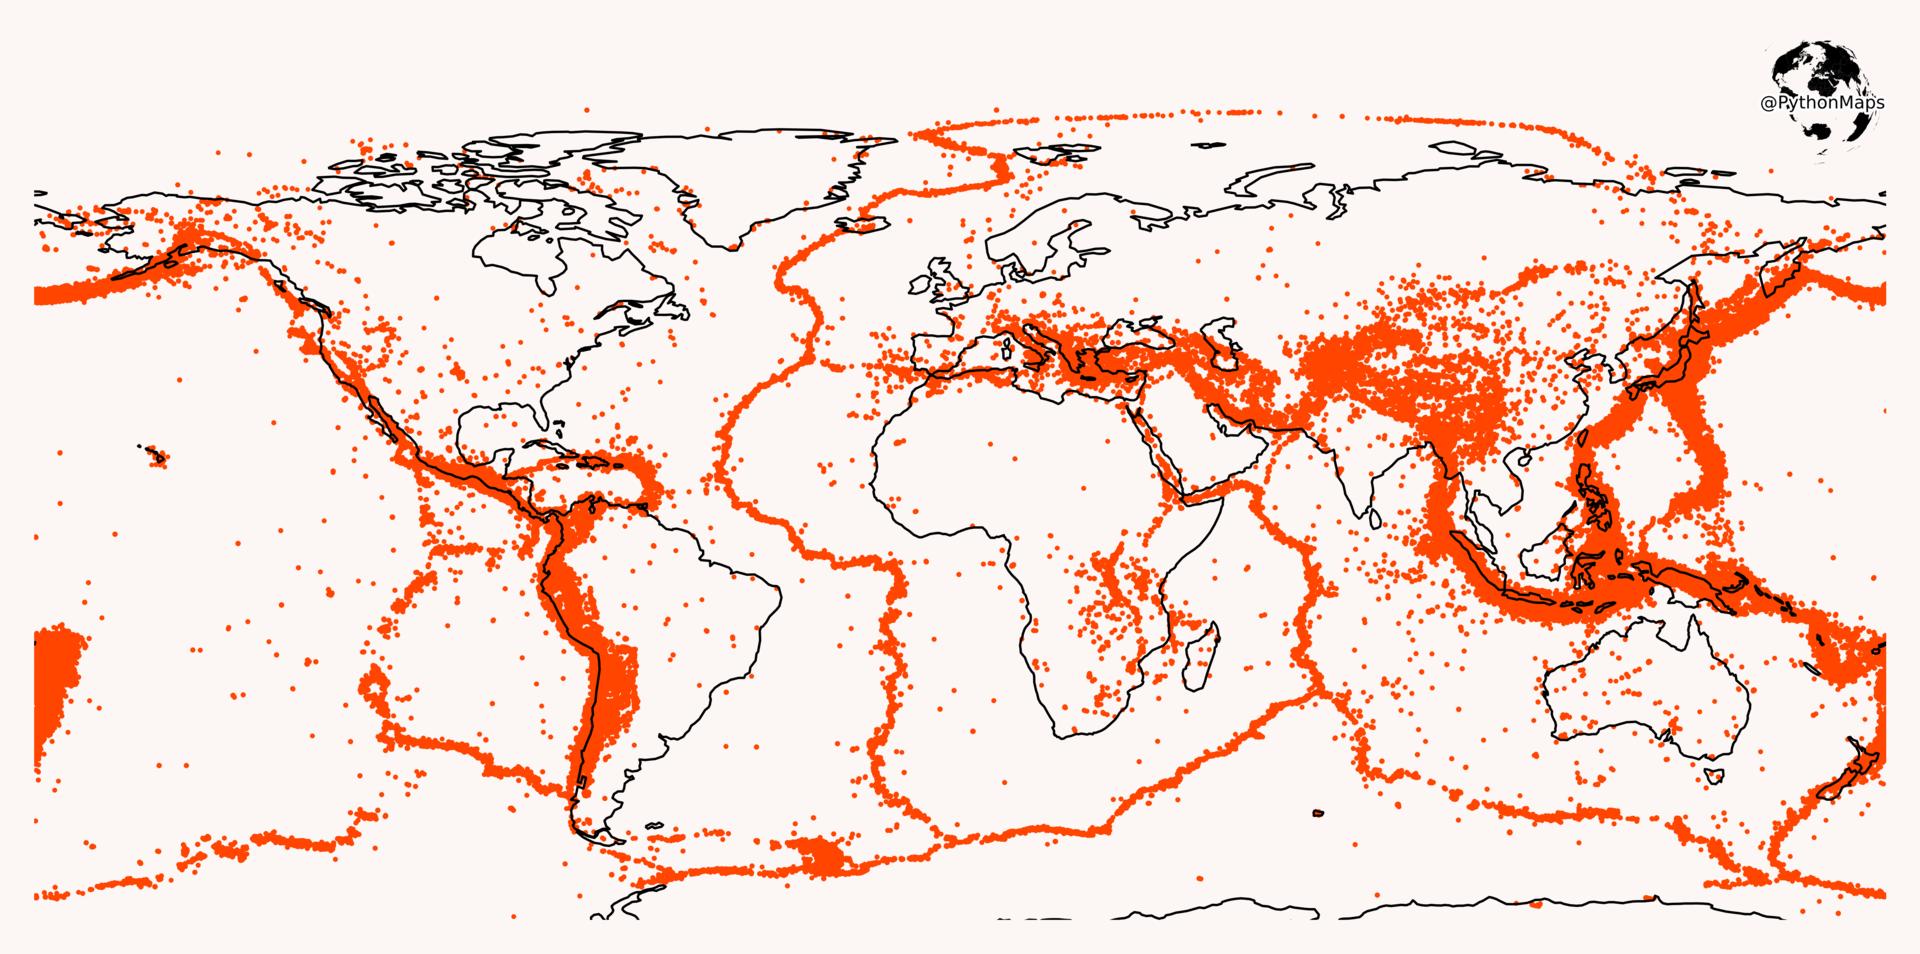 usgs earthquakes